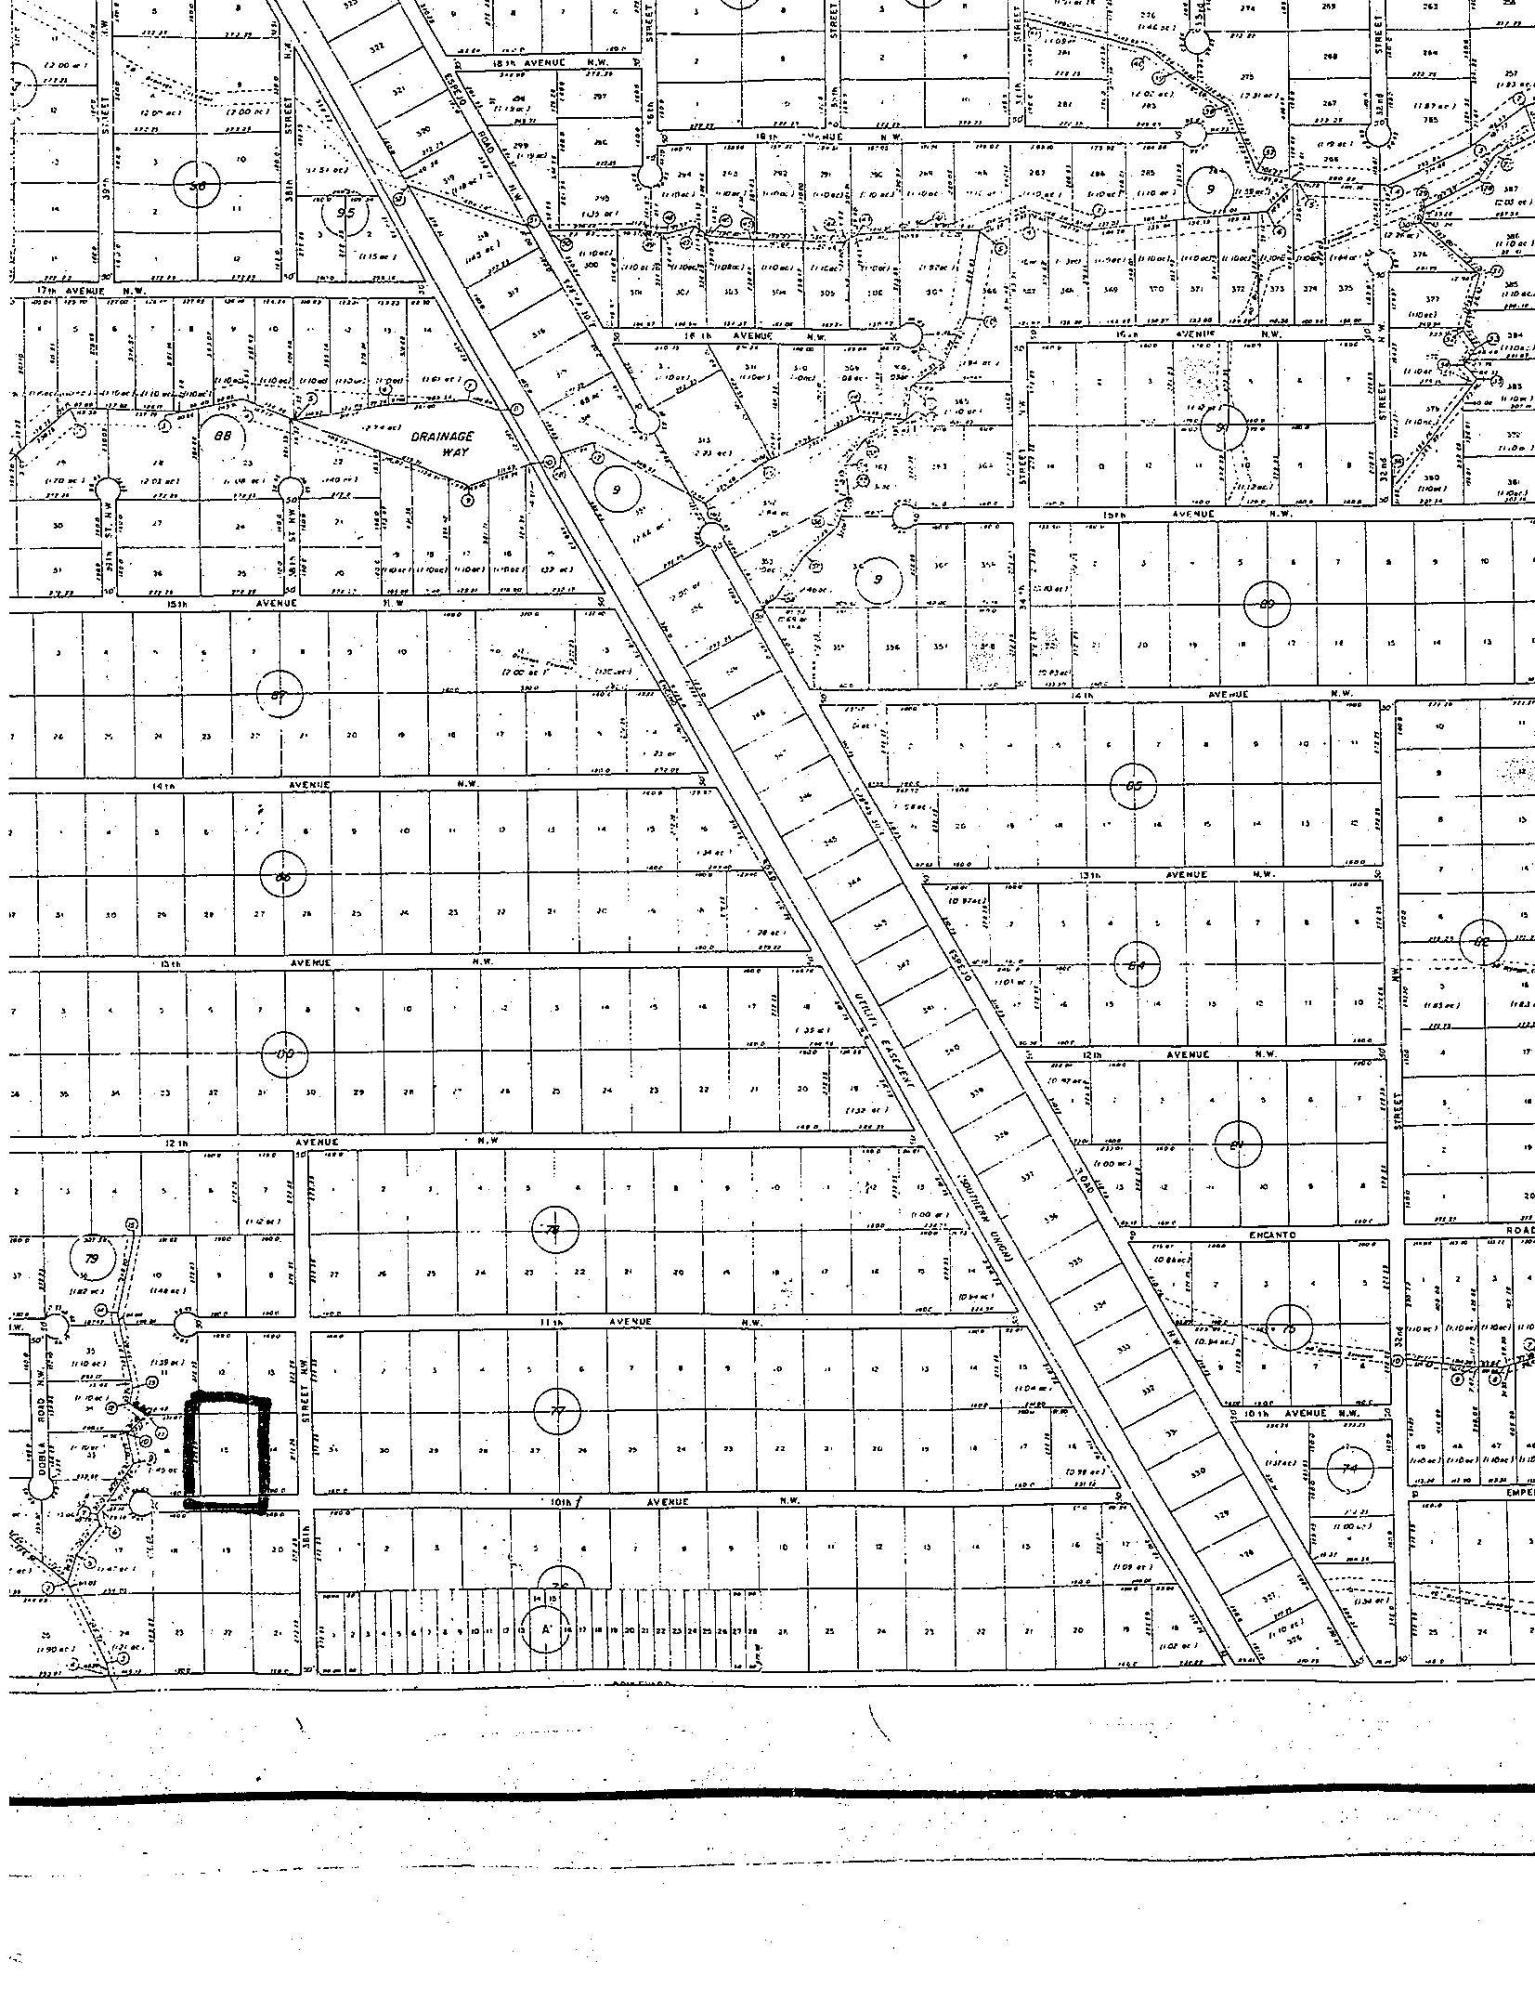 L15 B79 U6 (10th Ave NW), Rio Rancho, New Mexico